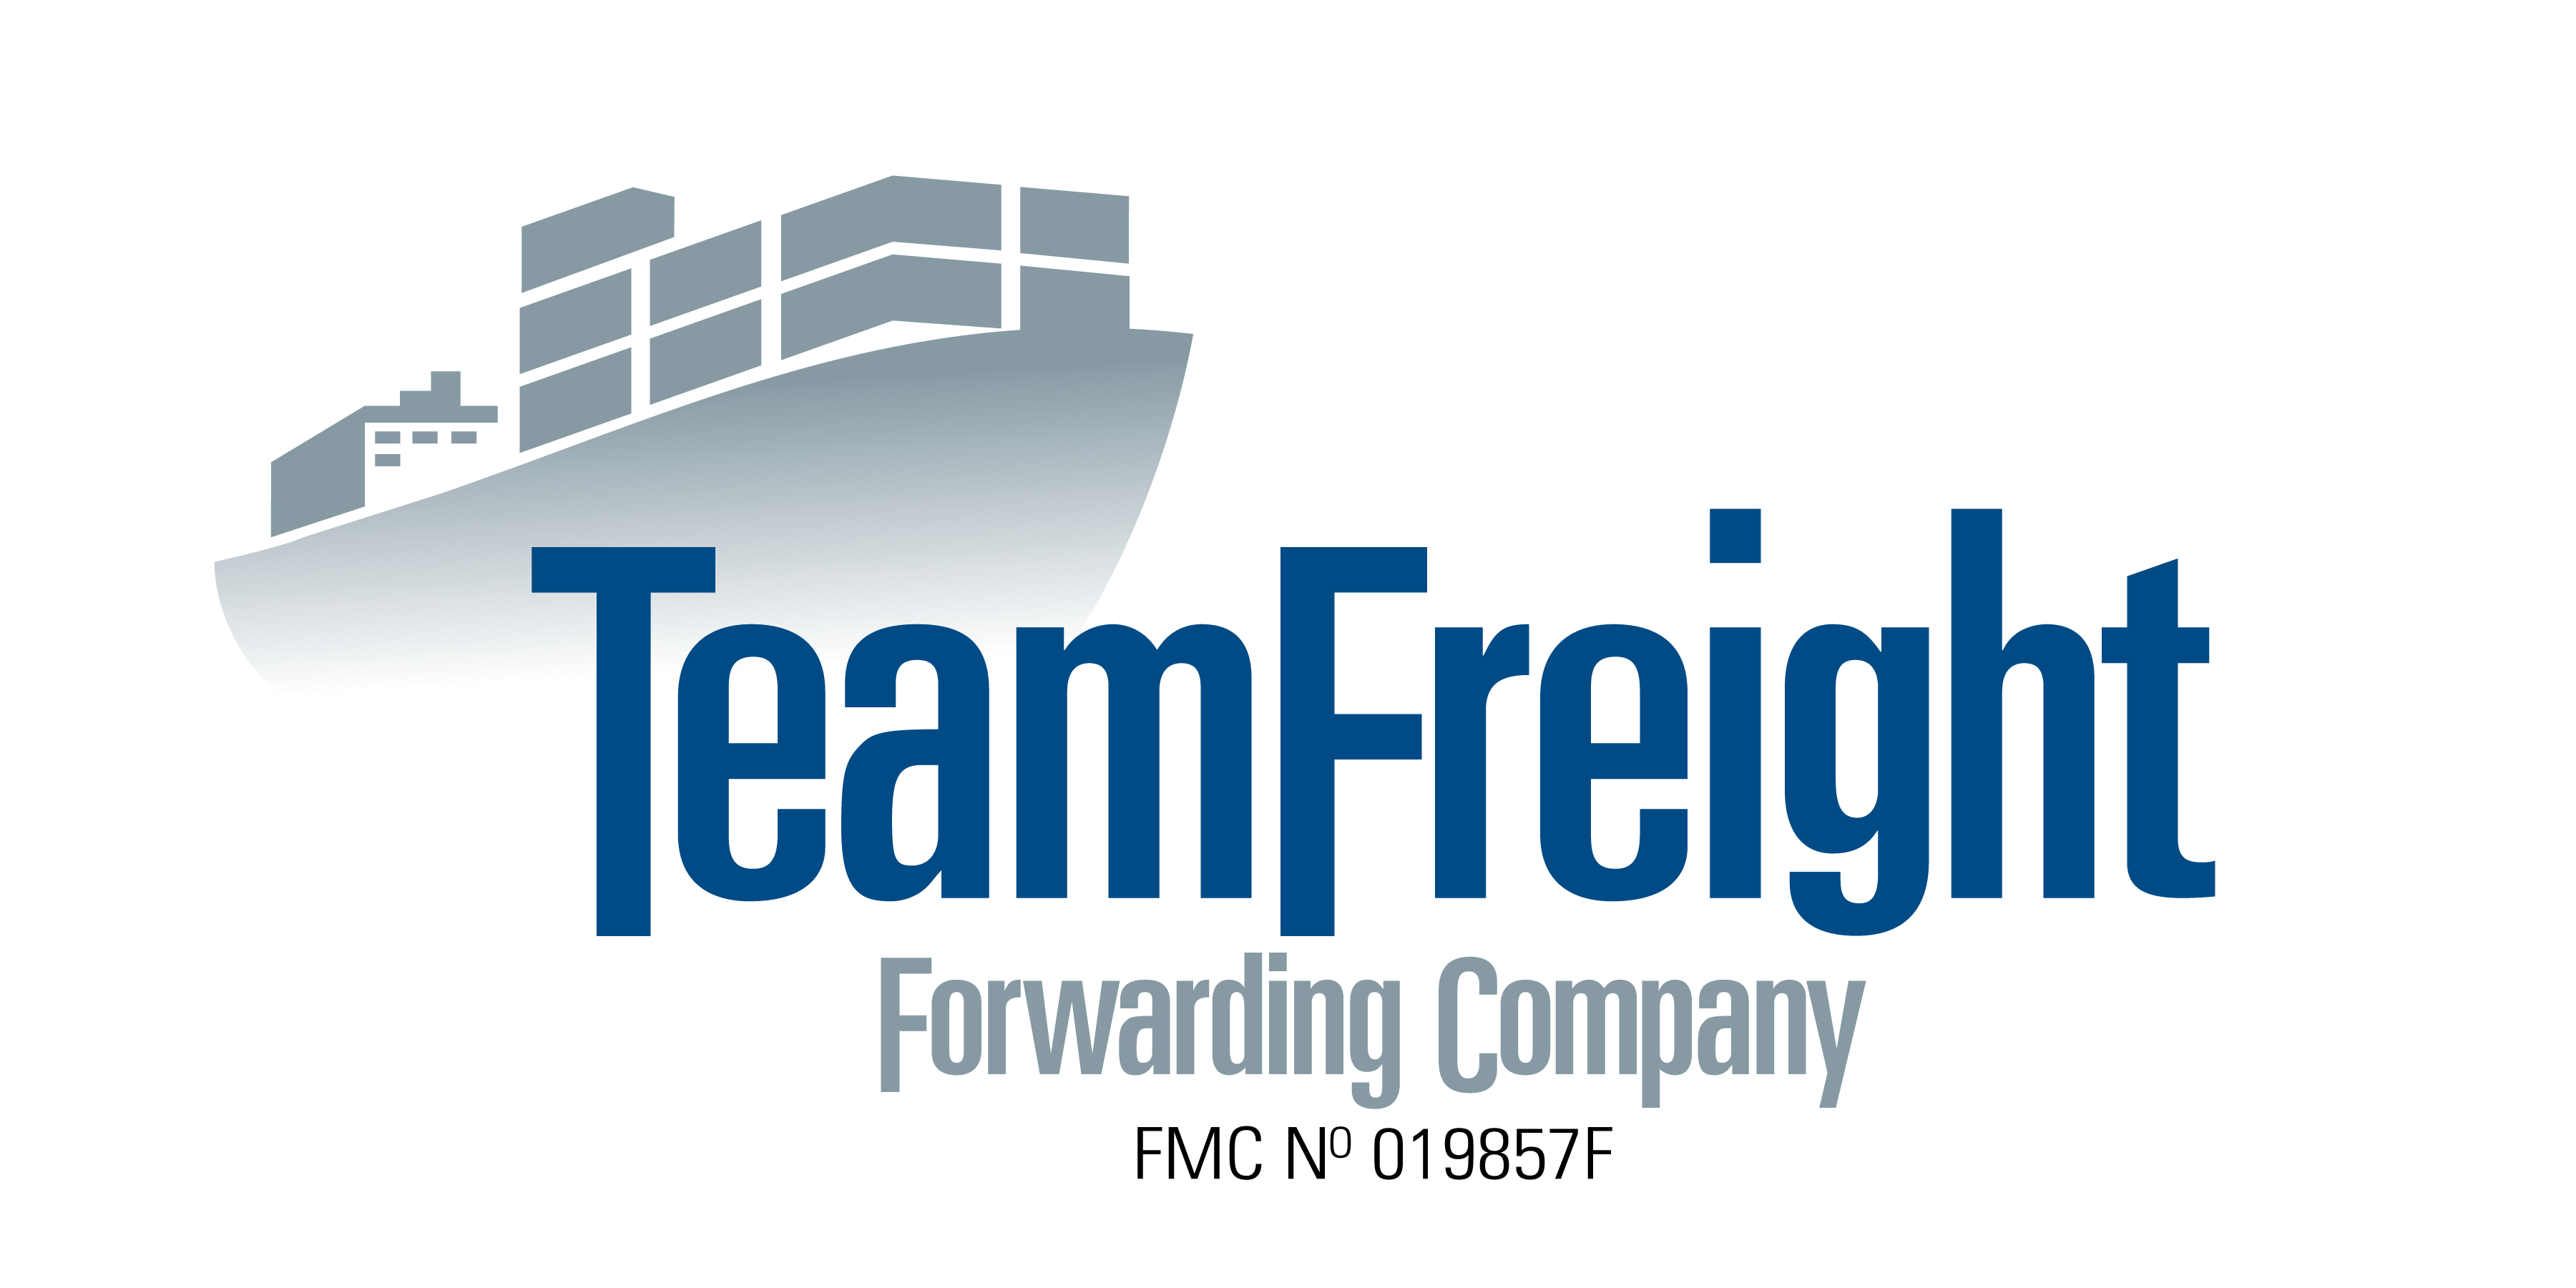 TeamFreight Forwarding Company image 1